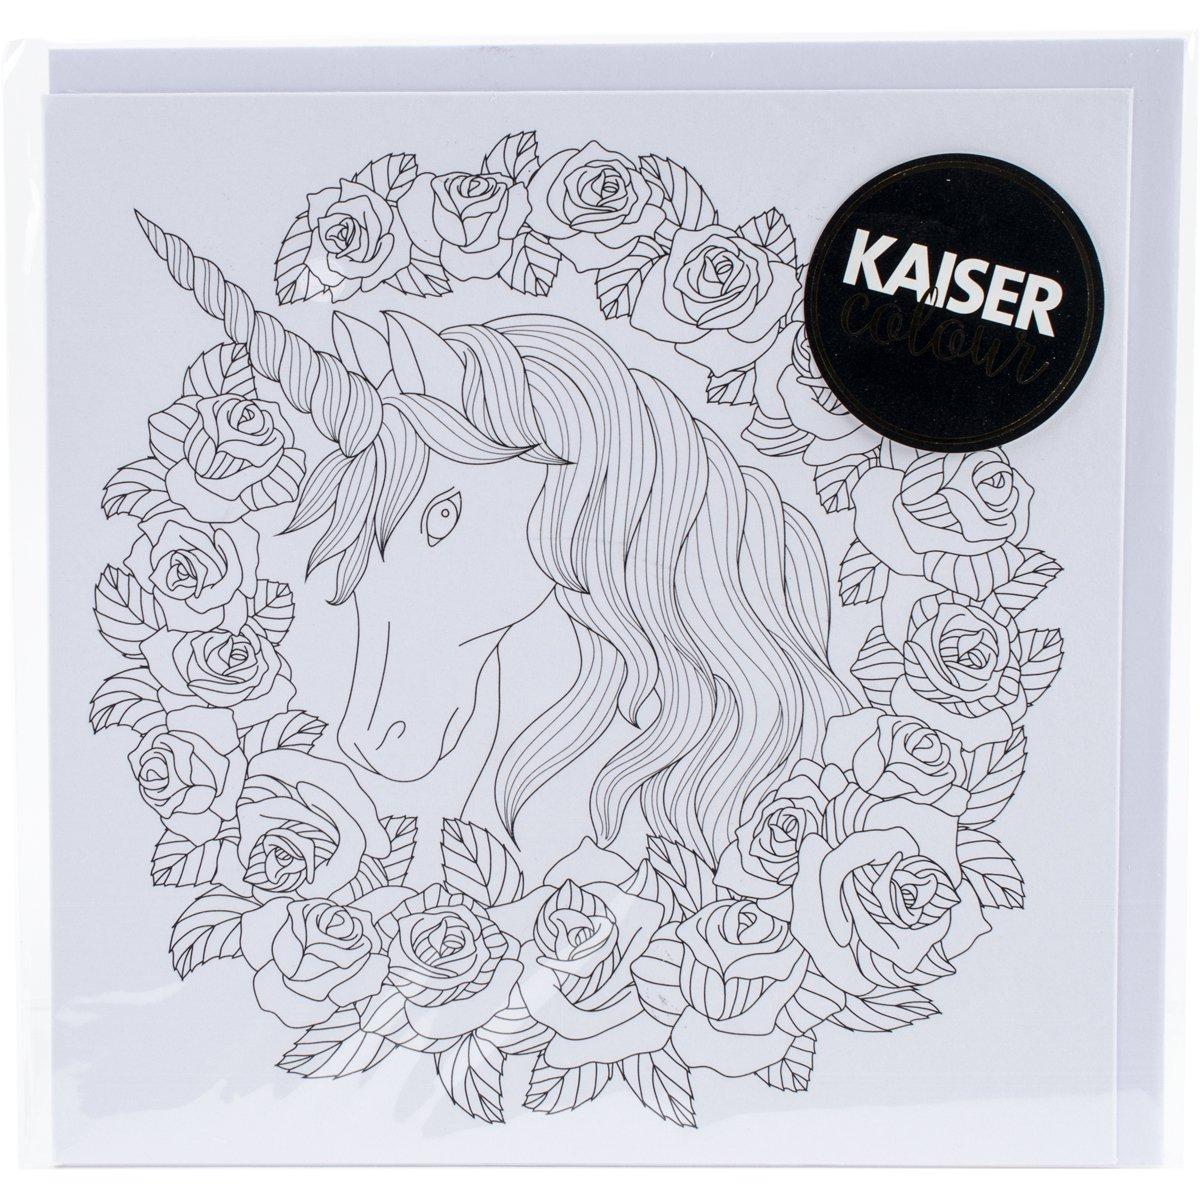 Kaisercraft Unicorn Kaisercolour Gift Card with Envelope, 6 x 6 6 x 6 CL1022